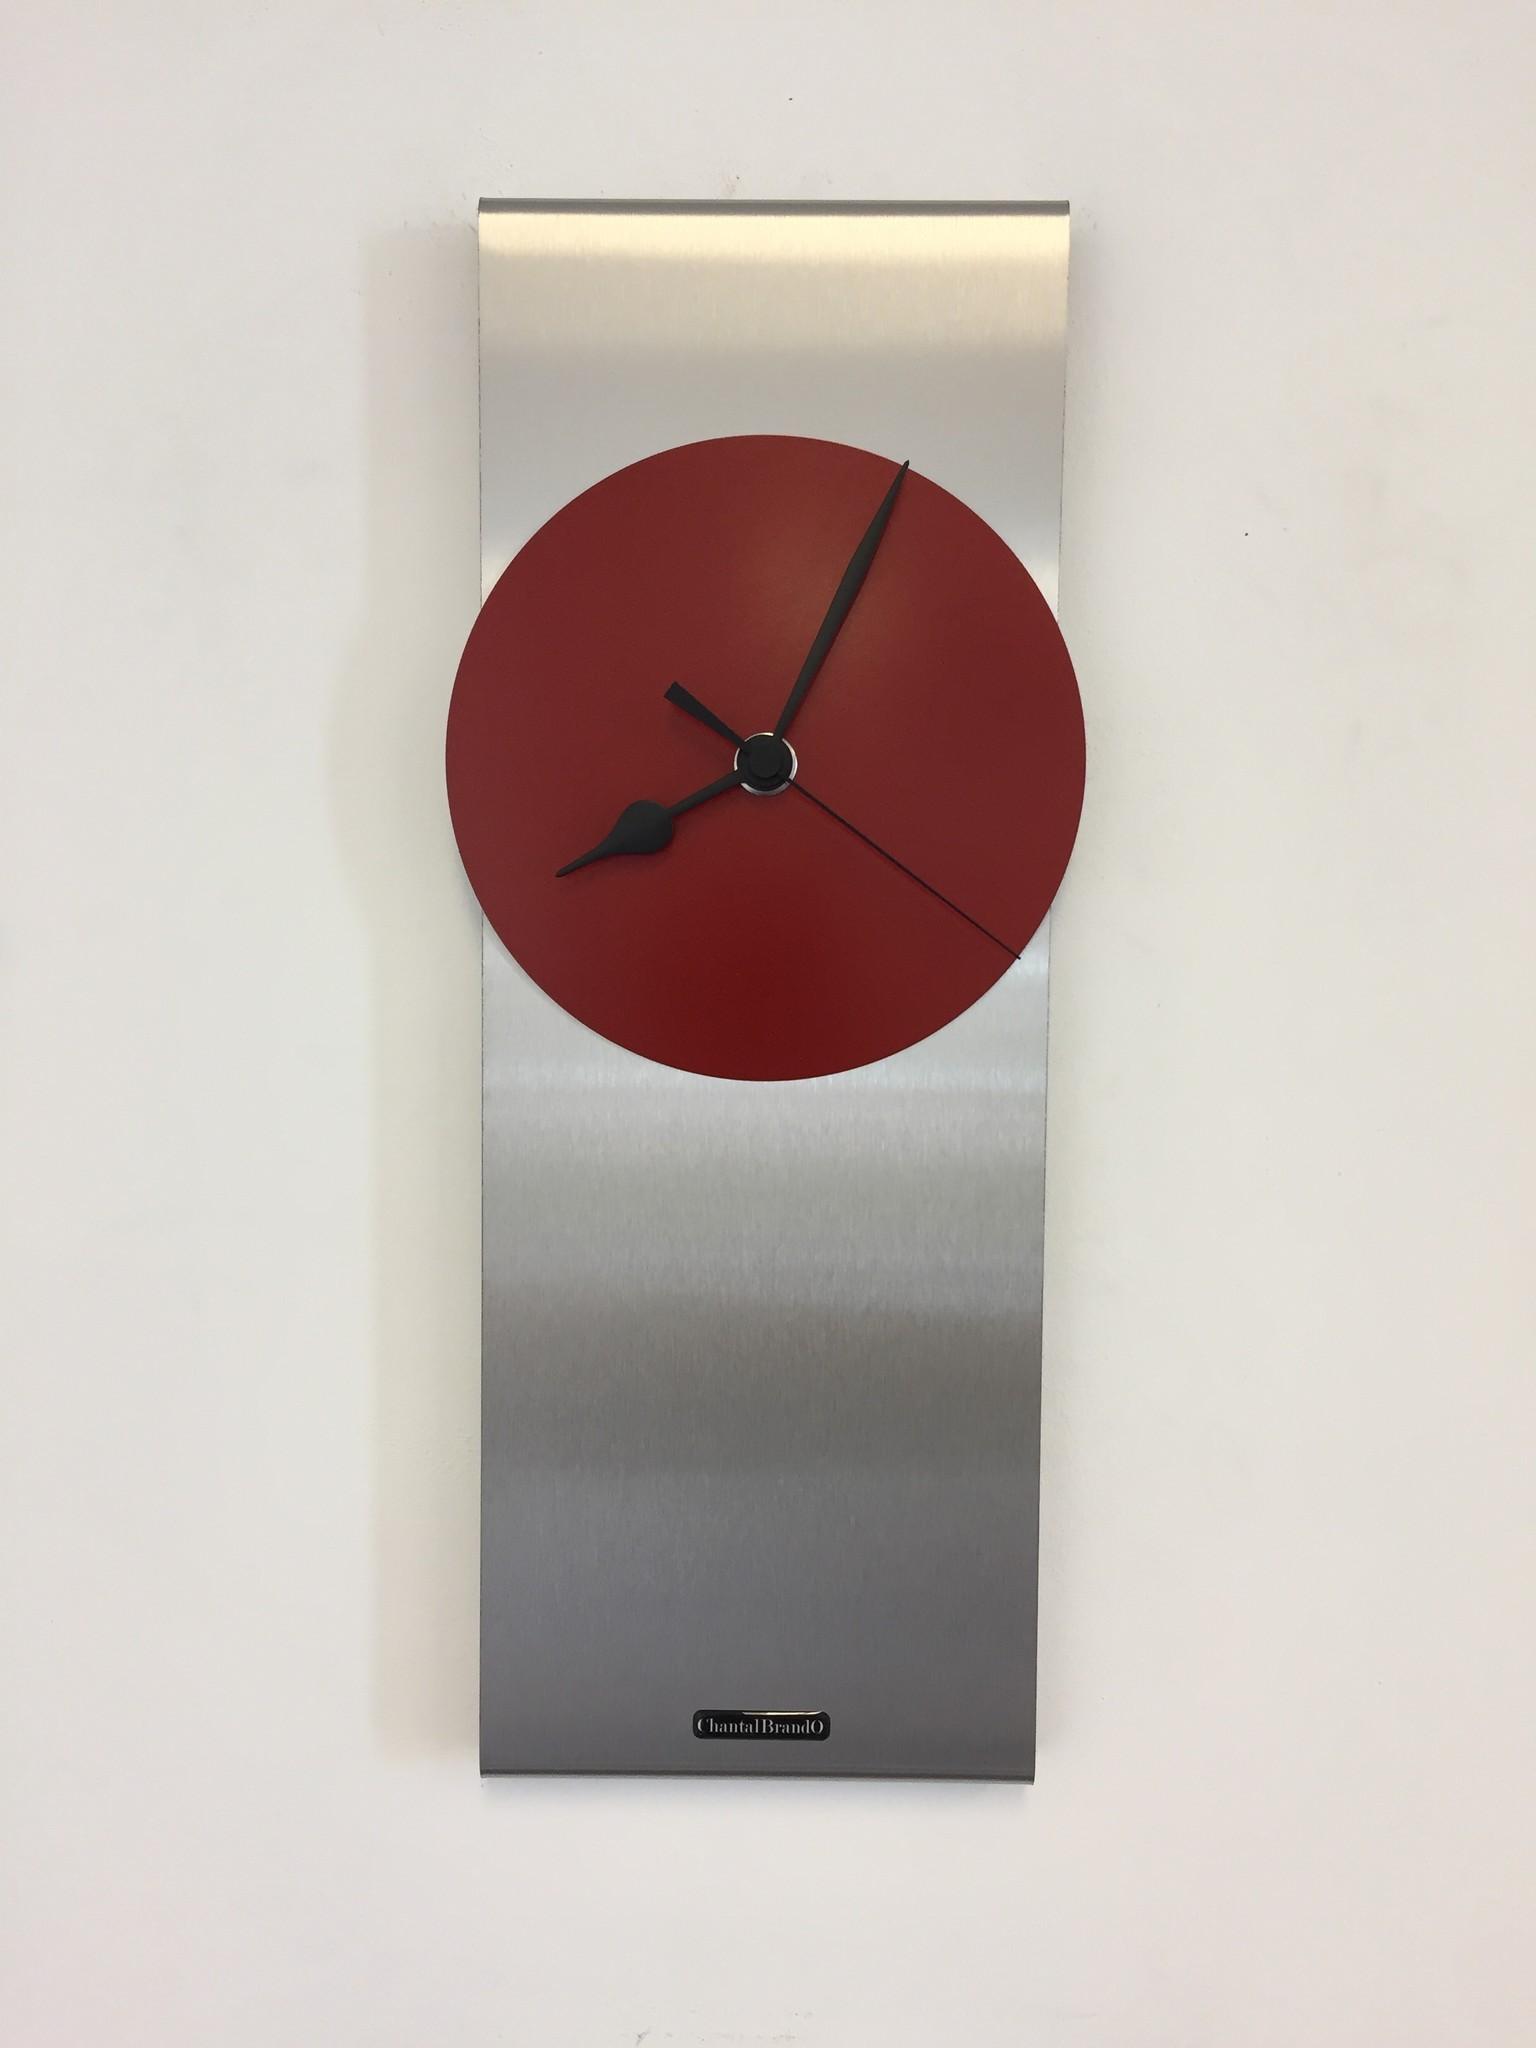 ChantalBrandO Wandklok ORION RED & BLACK Modern Dutch Design